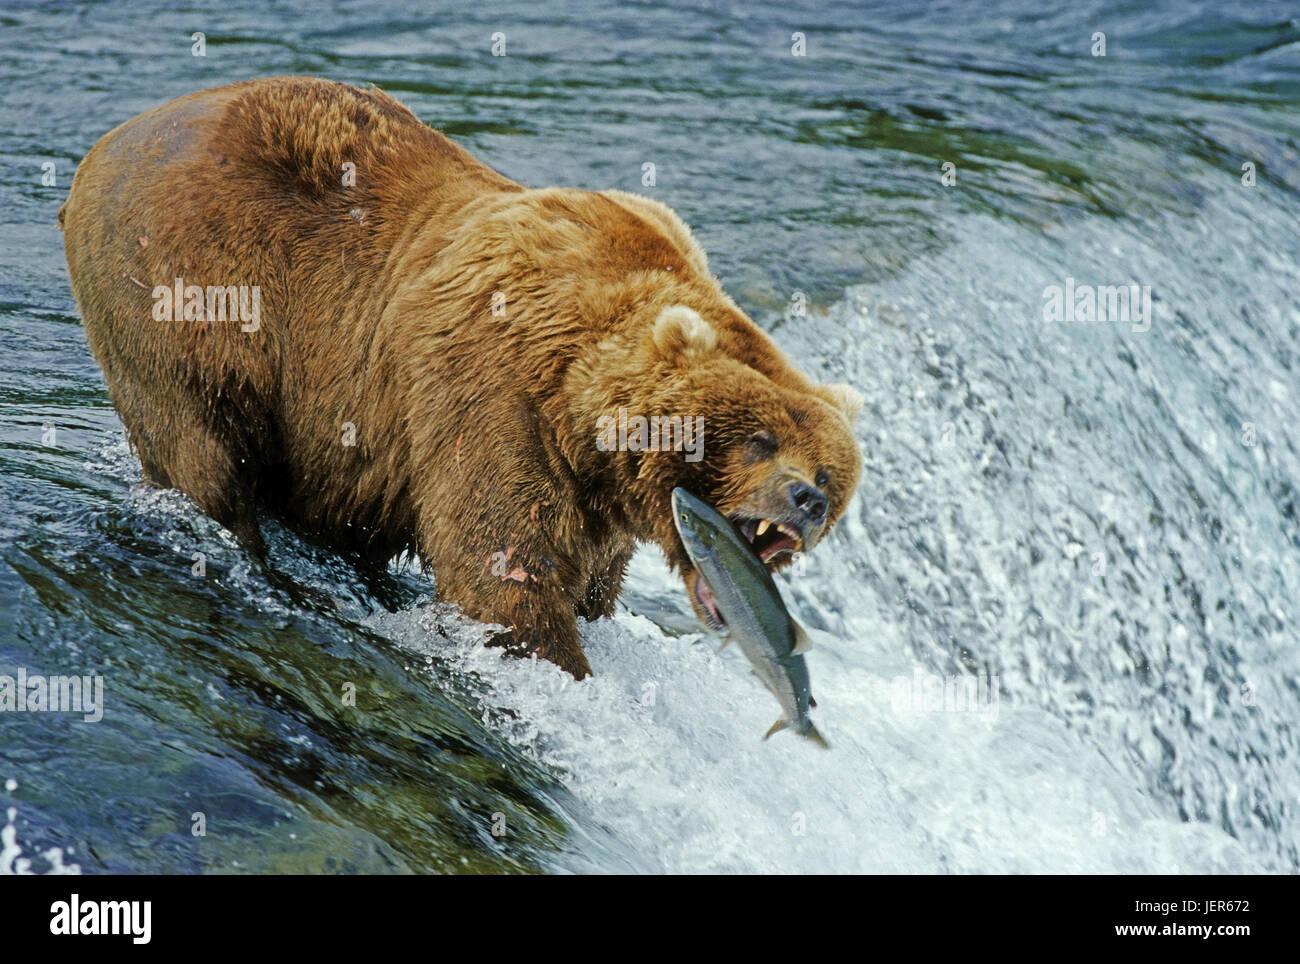 Brown bear catches salmon, Braunbaer faengt Lachs - Stock Image